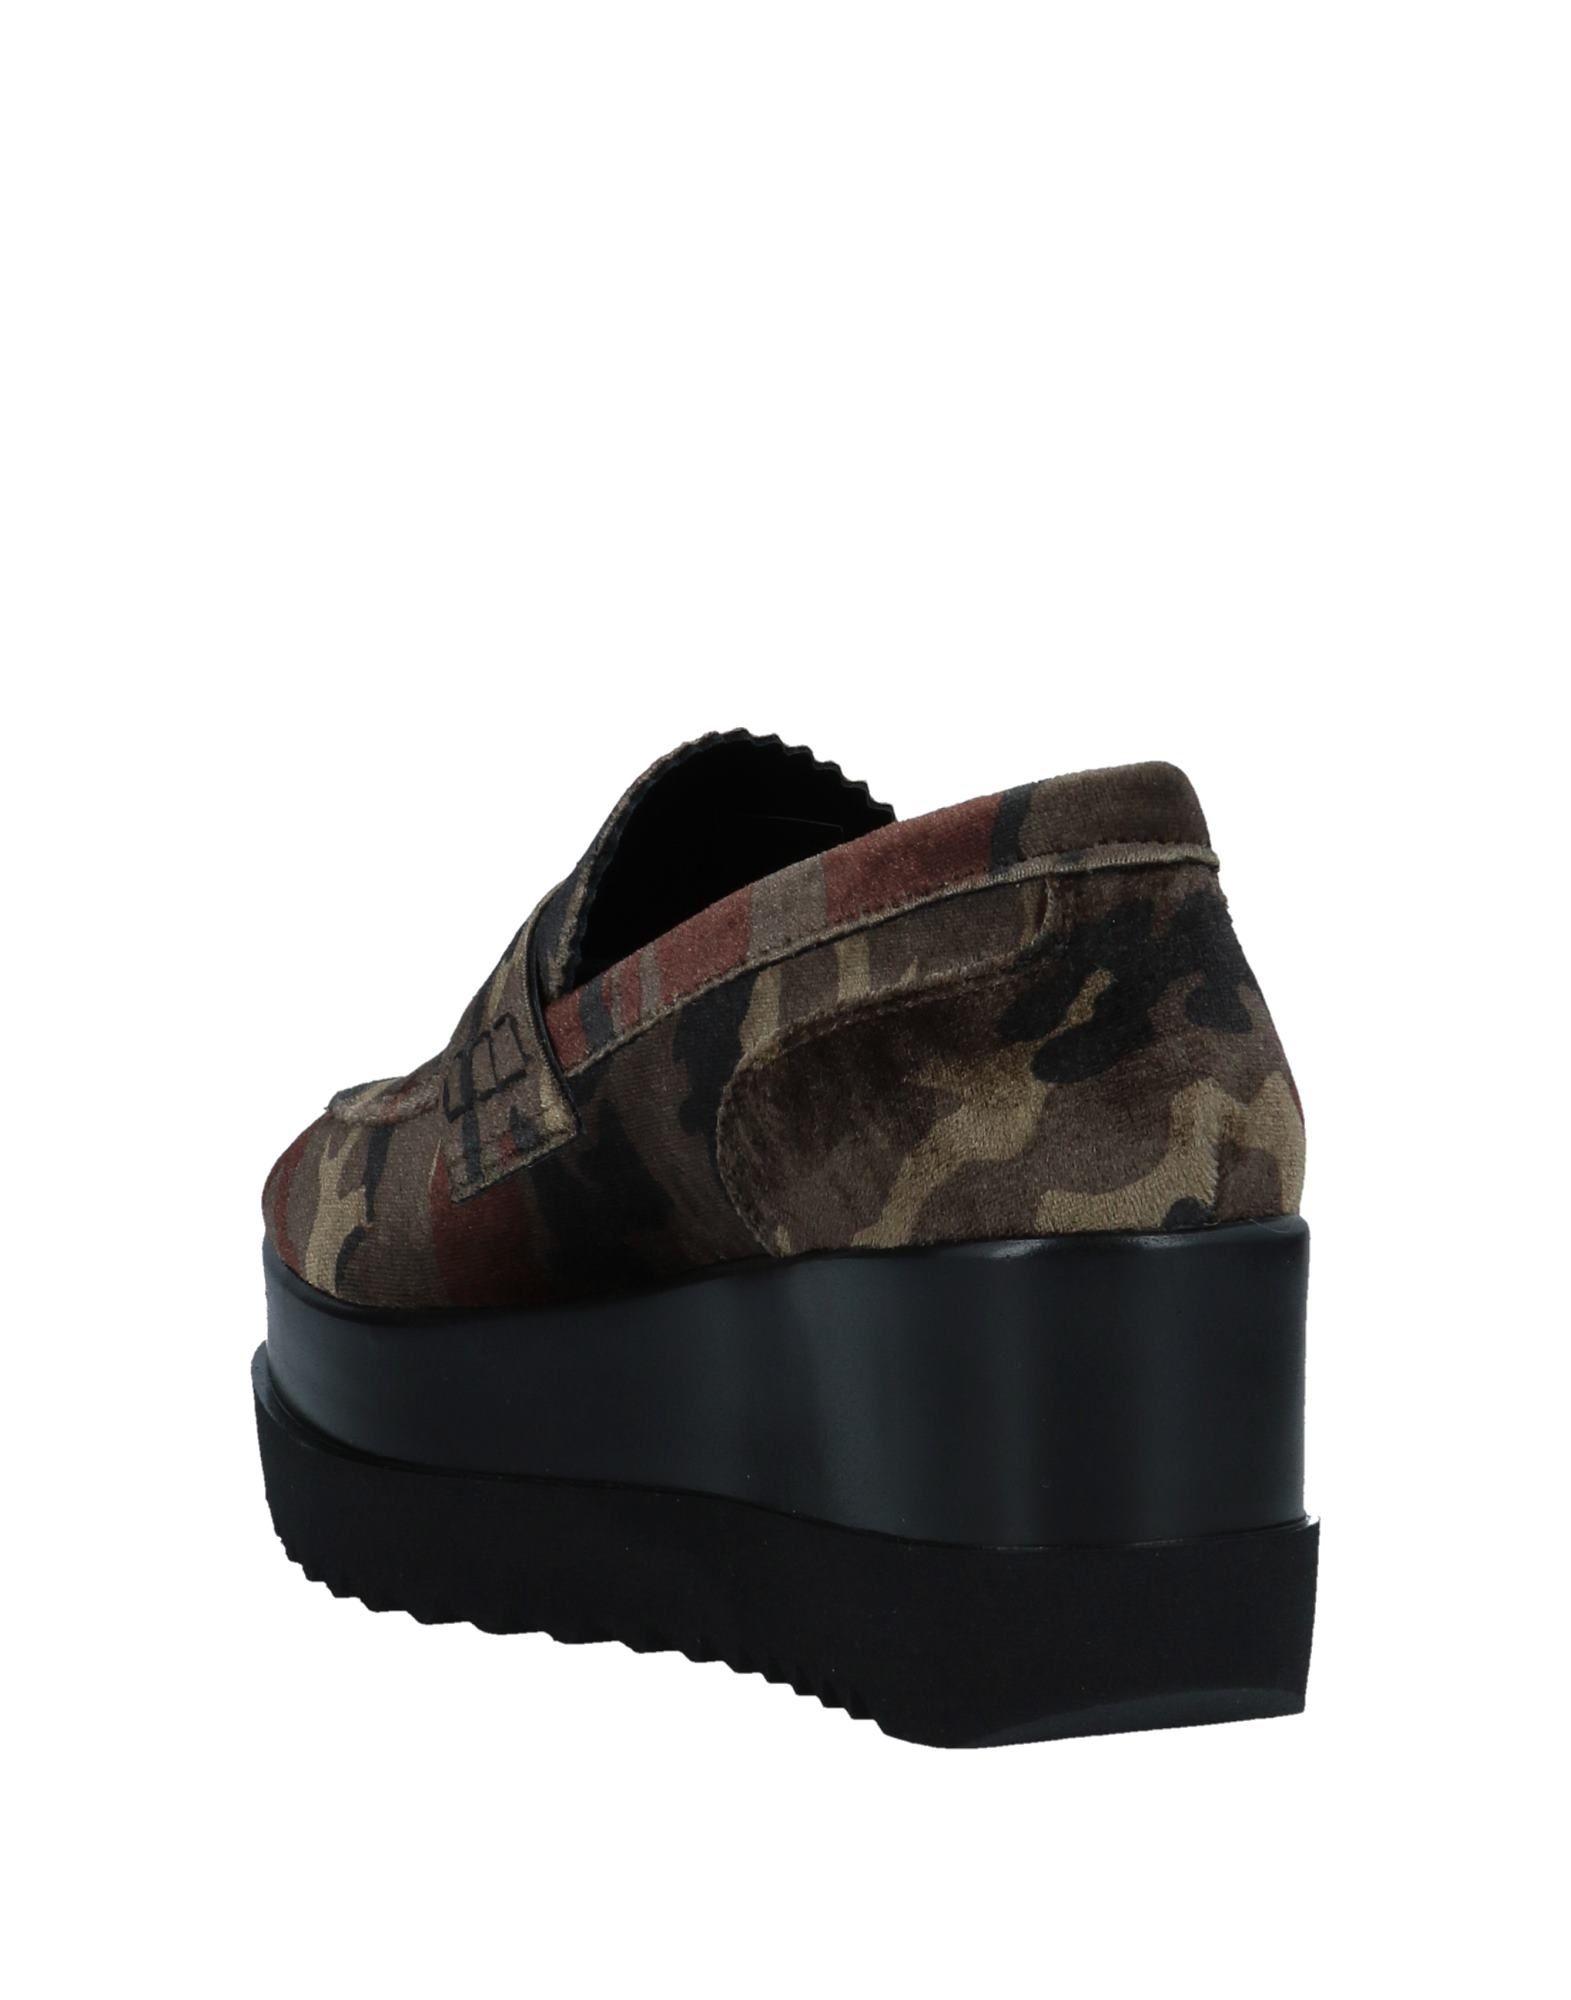 Todai Pantoletten Damen  beliebte 11557824DL Gute Qualität beliebte  Schuhe f51f91